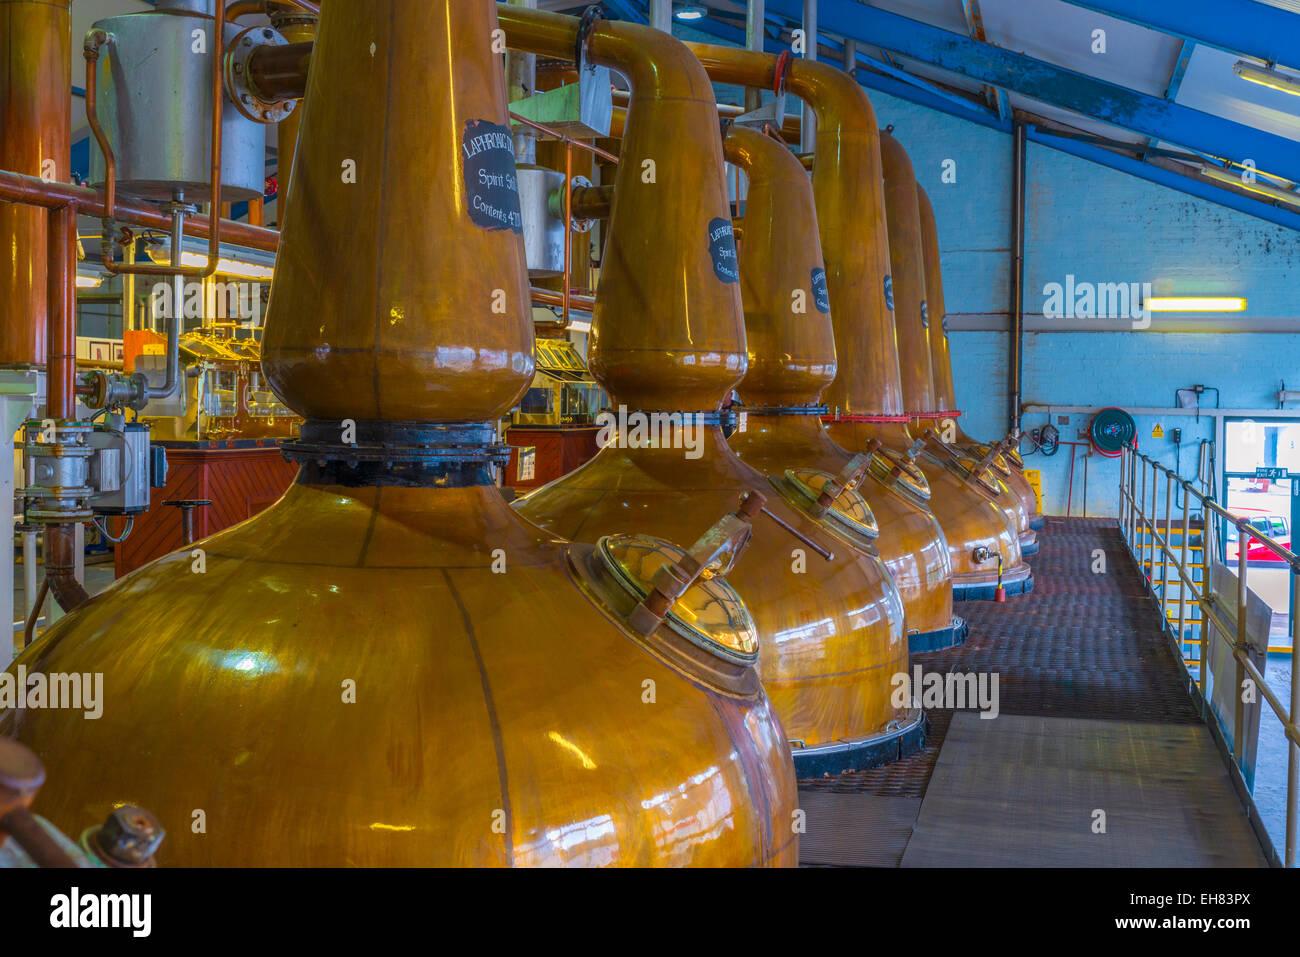 Copper pot stills, Laphroaig Whisky Distillery, Islay, Argyll and Bute, Scotland, United Kingdom, Europe - Stock Image